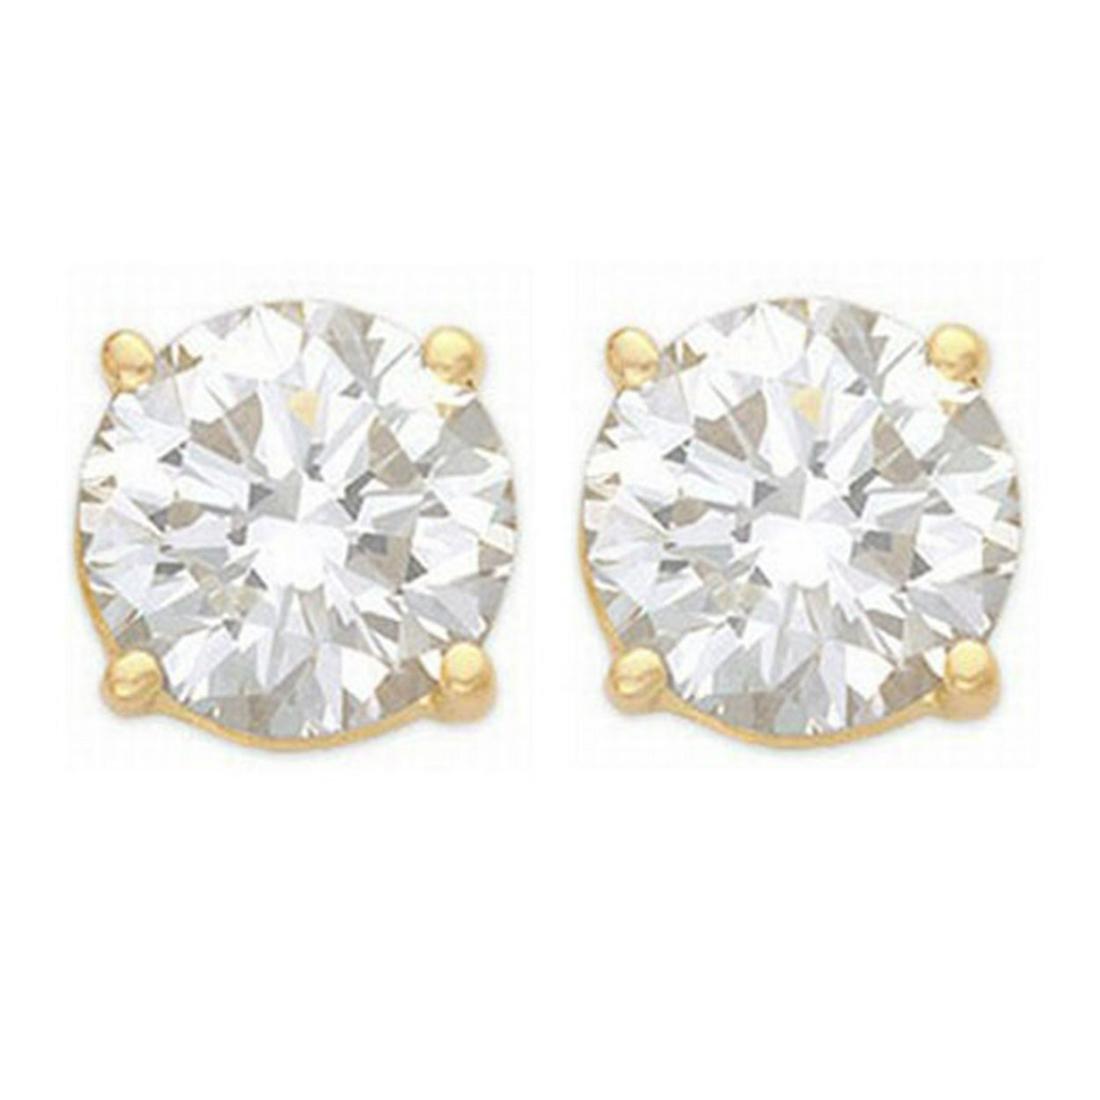 2.50 ctw VS/SI Diamond Stud Earrings 14K Yellow Gold -